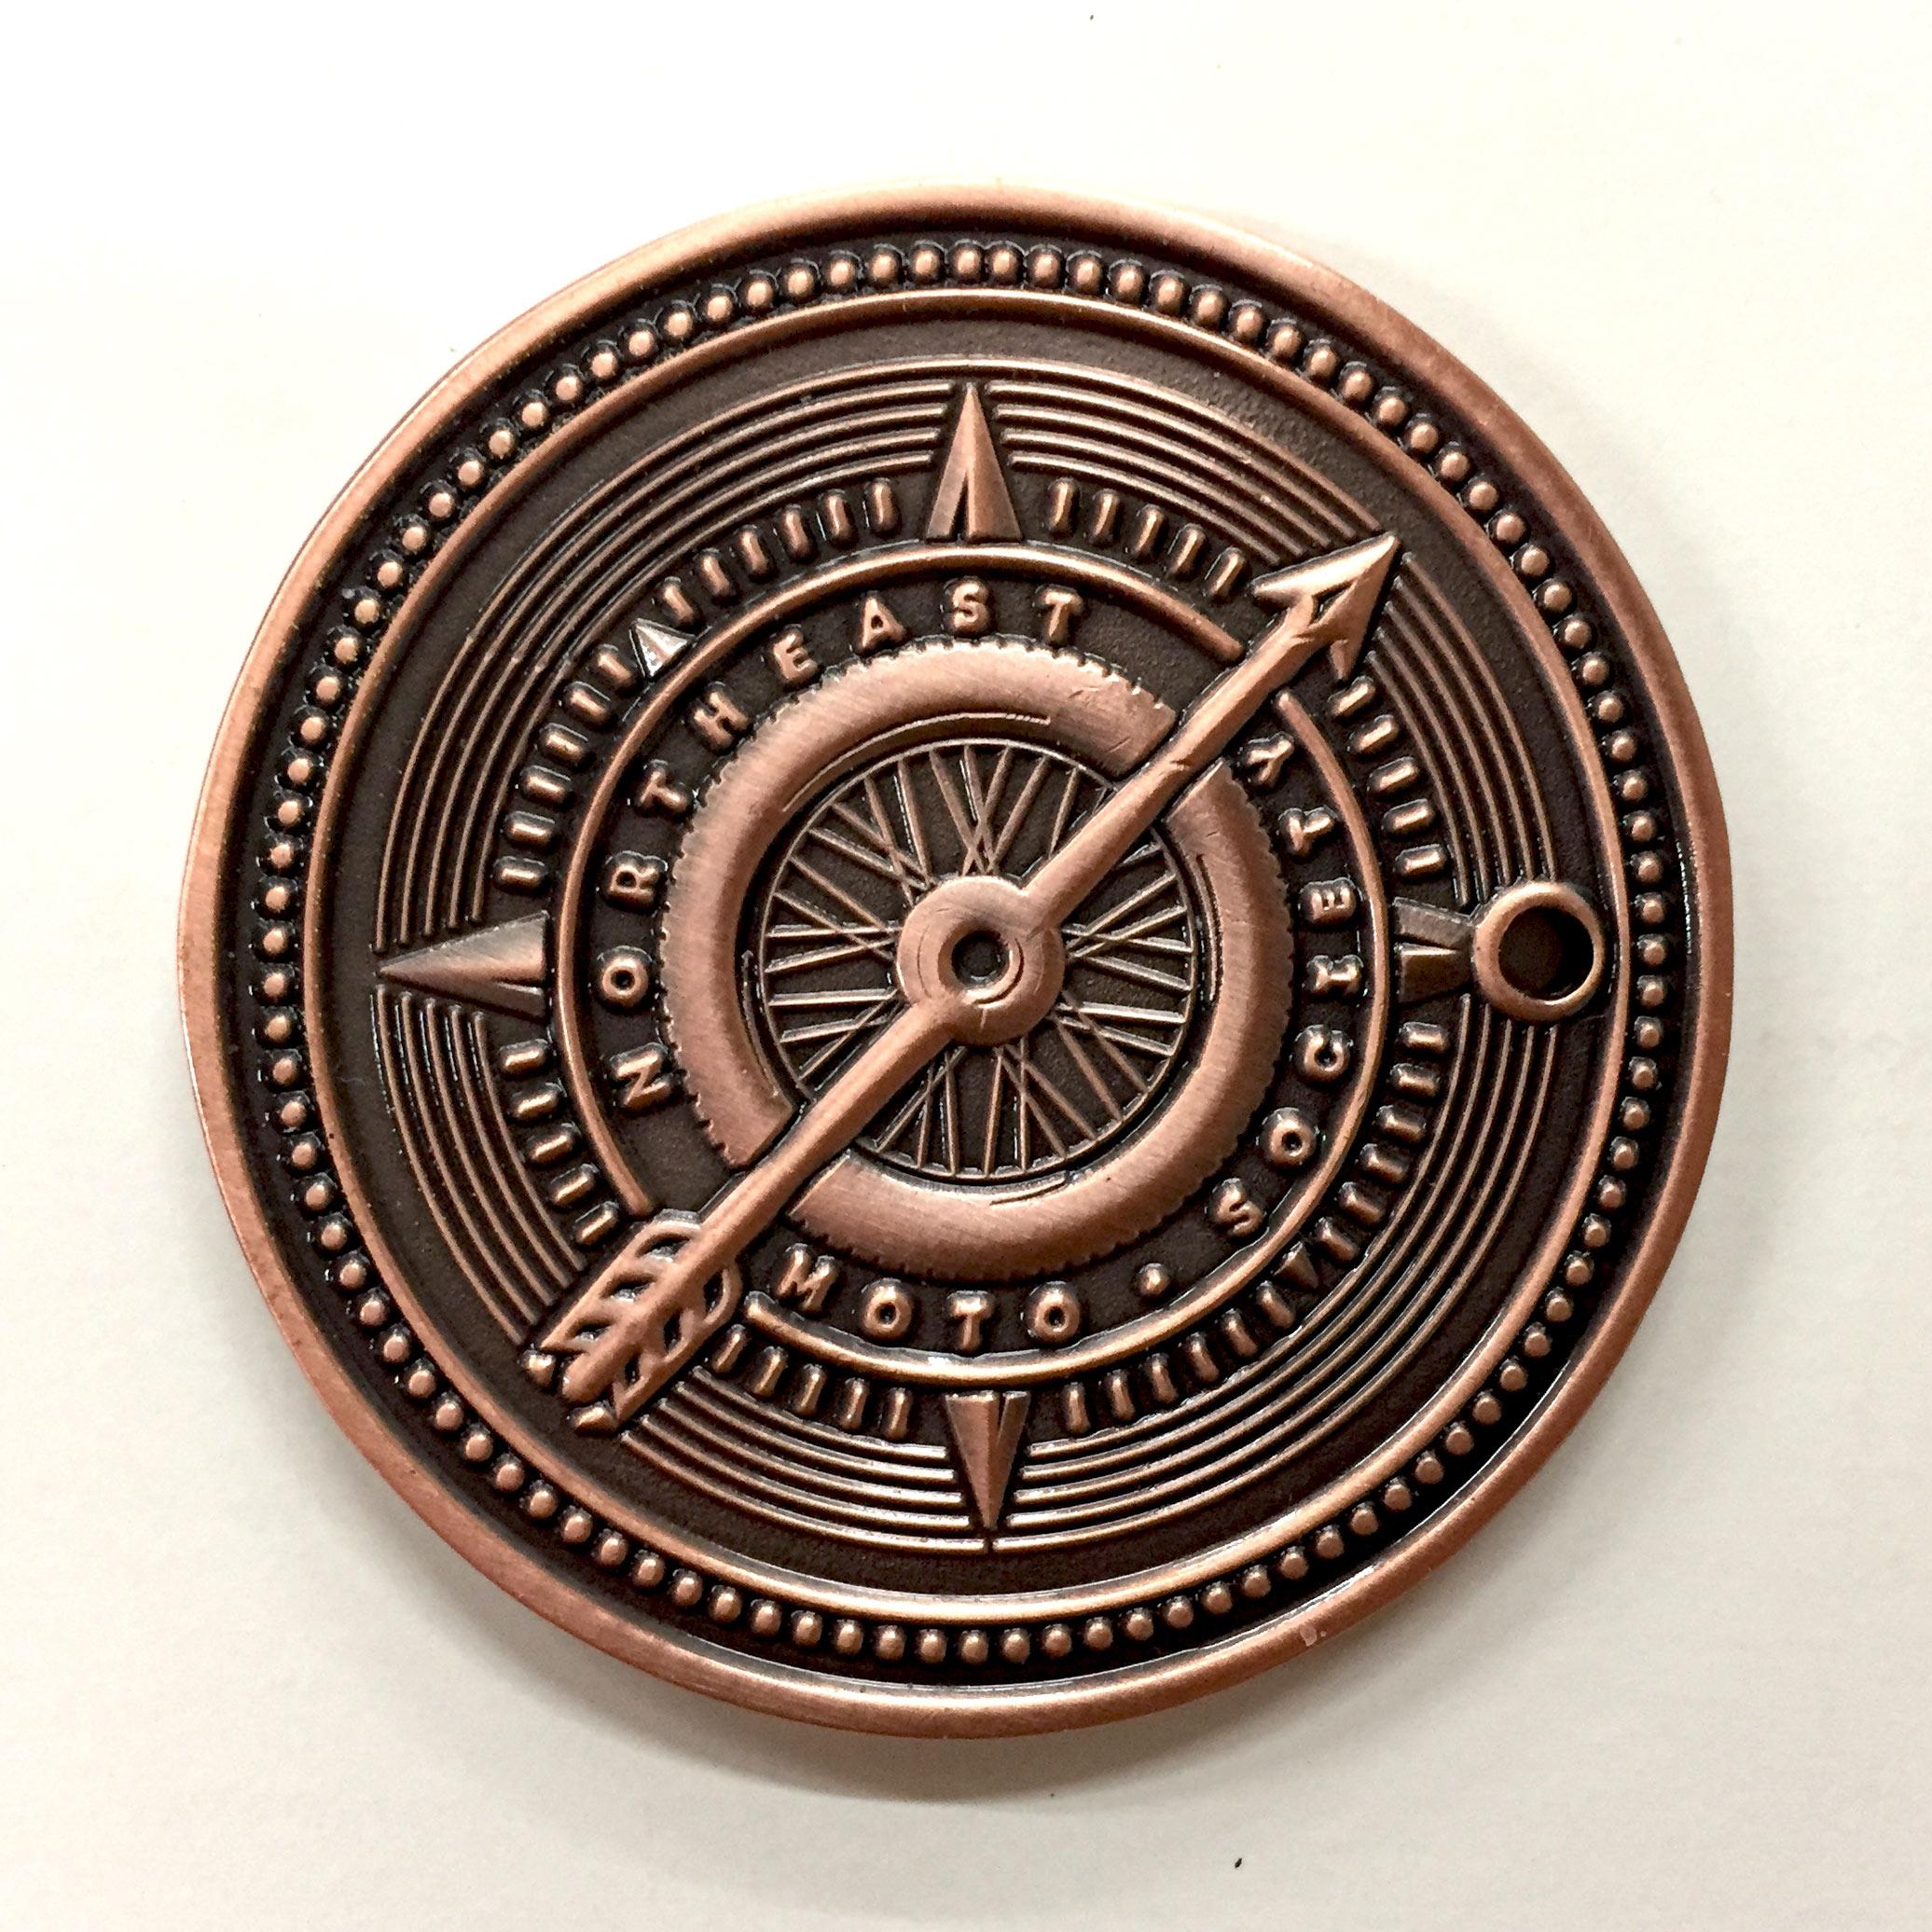 Tail - NEMS 2017 Membership Coin